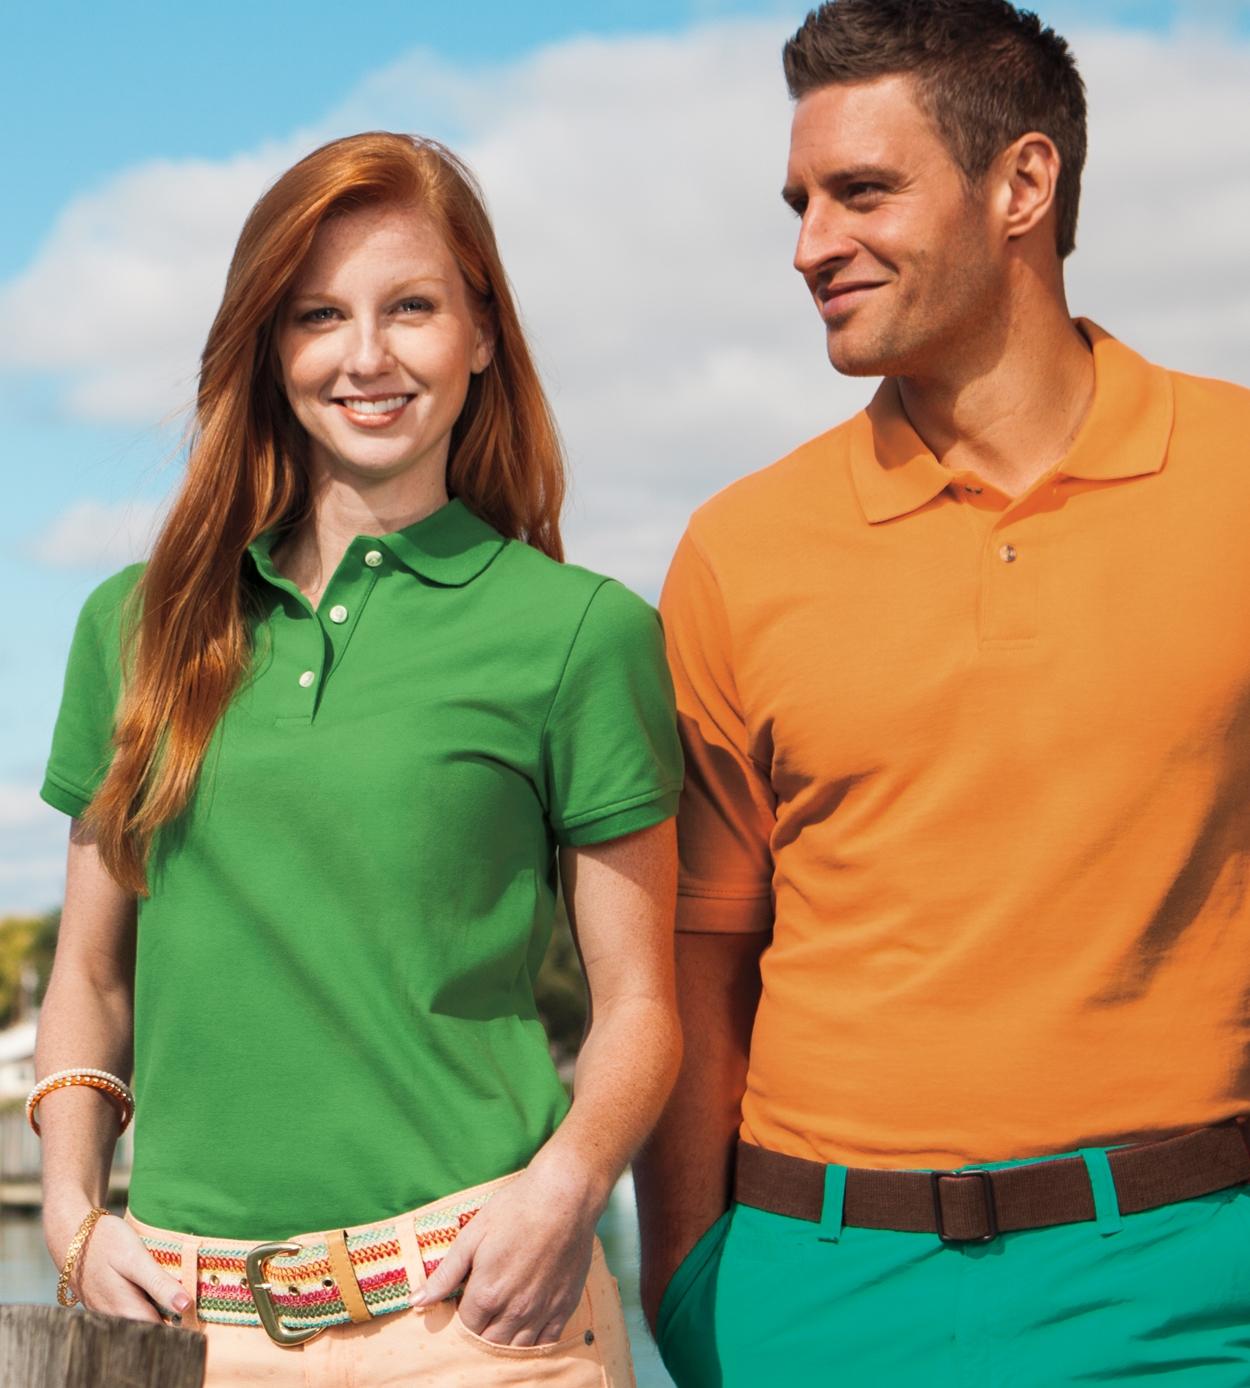 d0fc788f1 Izod Mens 6.5 oz. Original Pique Sport Shirts 99299 / 13Z0012